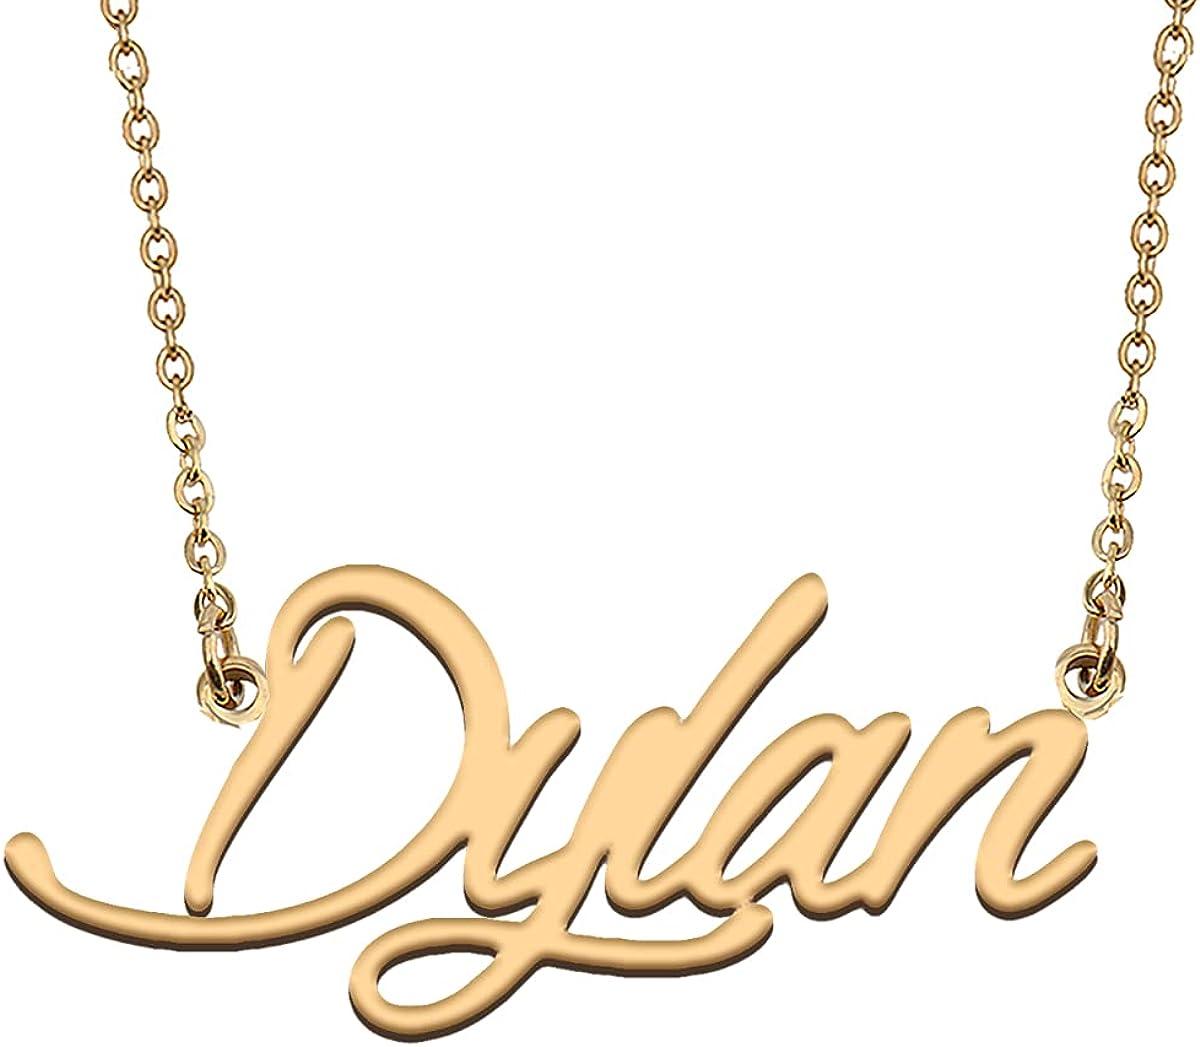 HUAN XUN Personalized Jewelry Custom Initial Pendant Custom Name Necklaces for Women Girls